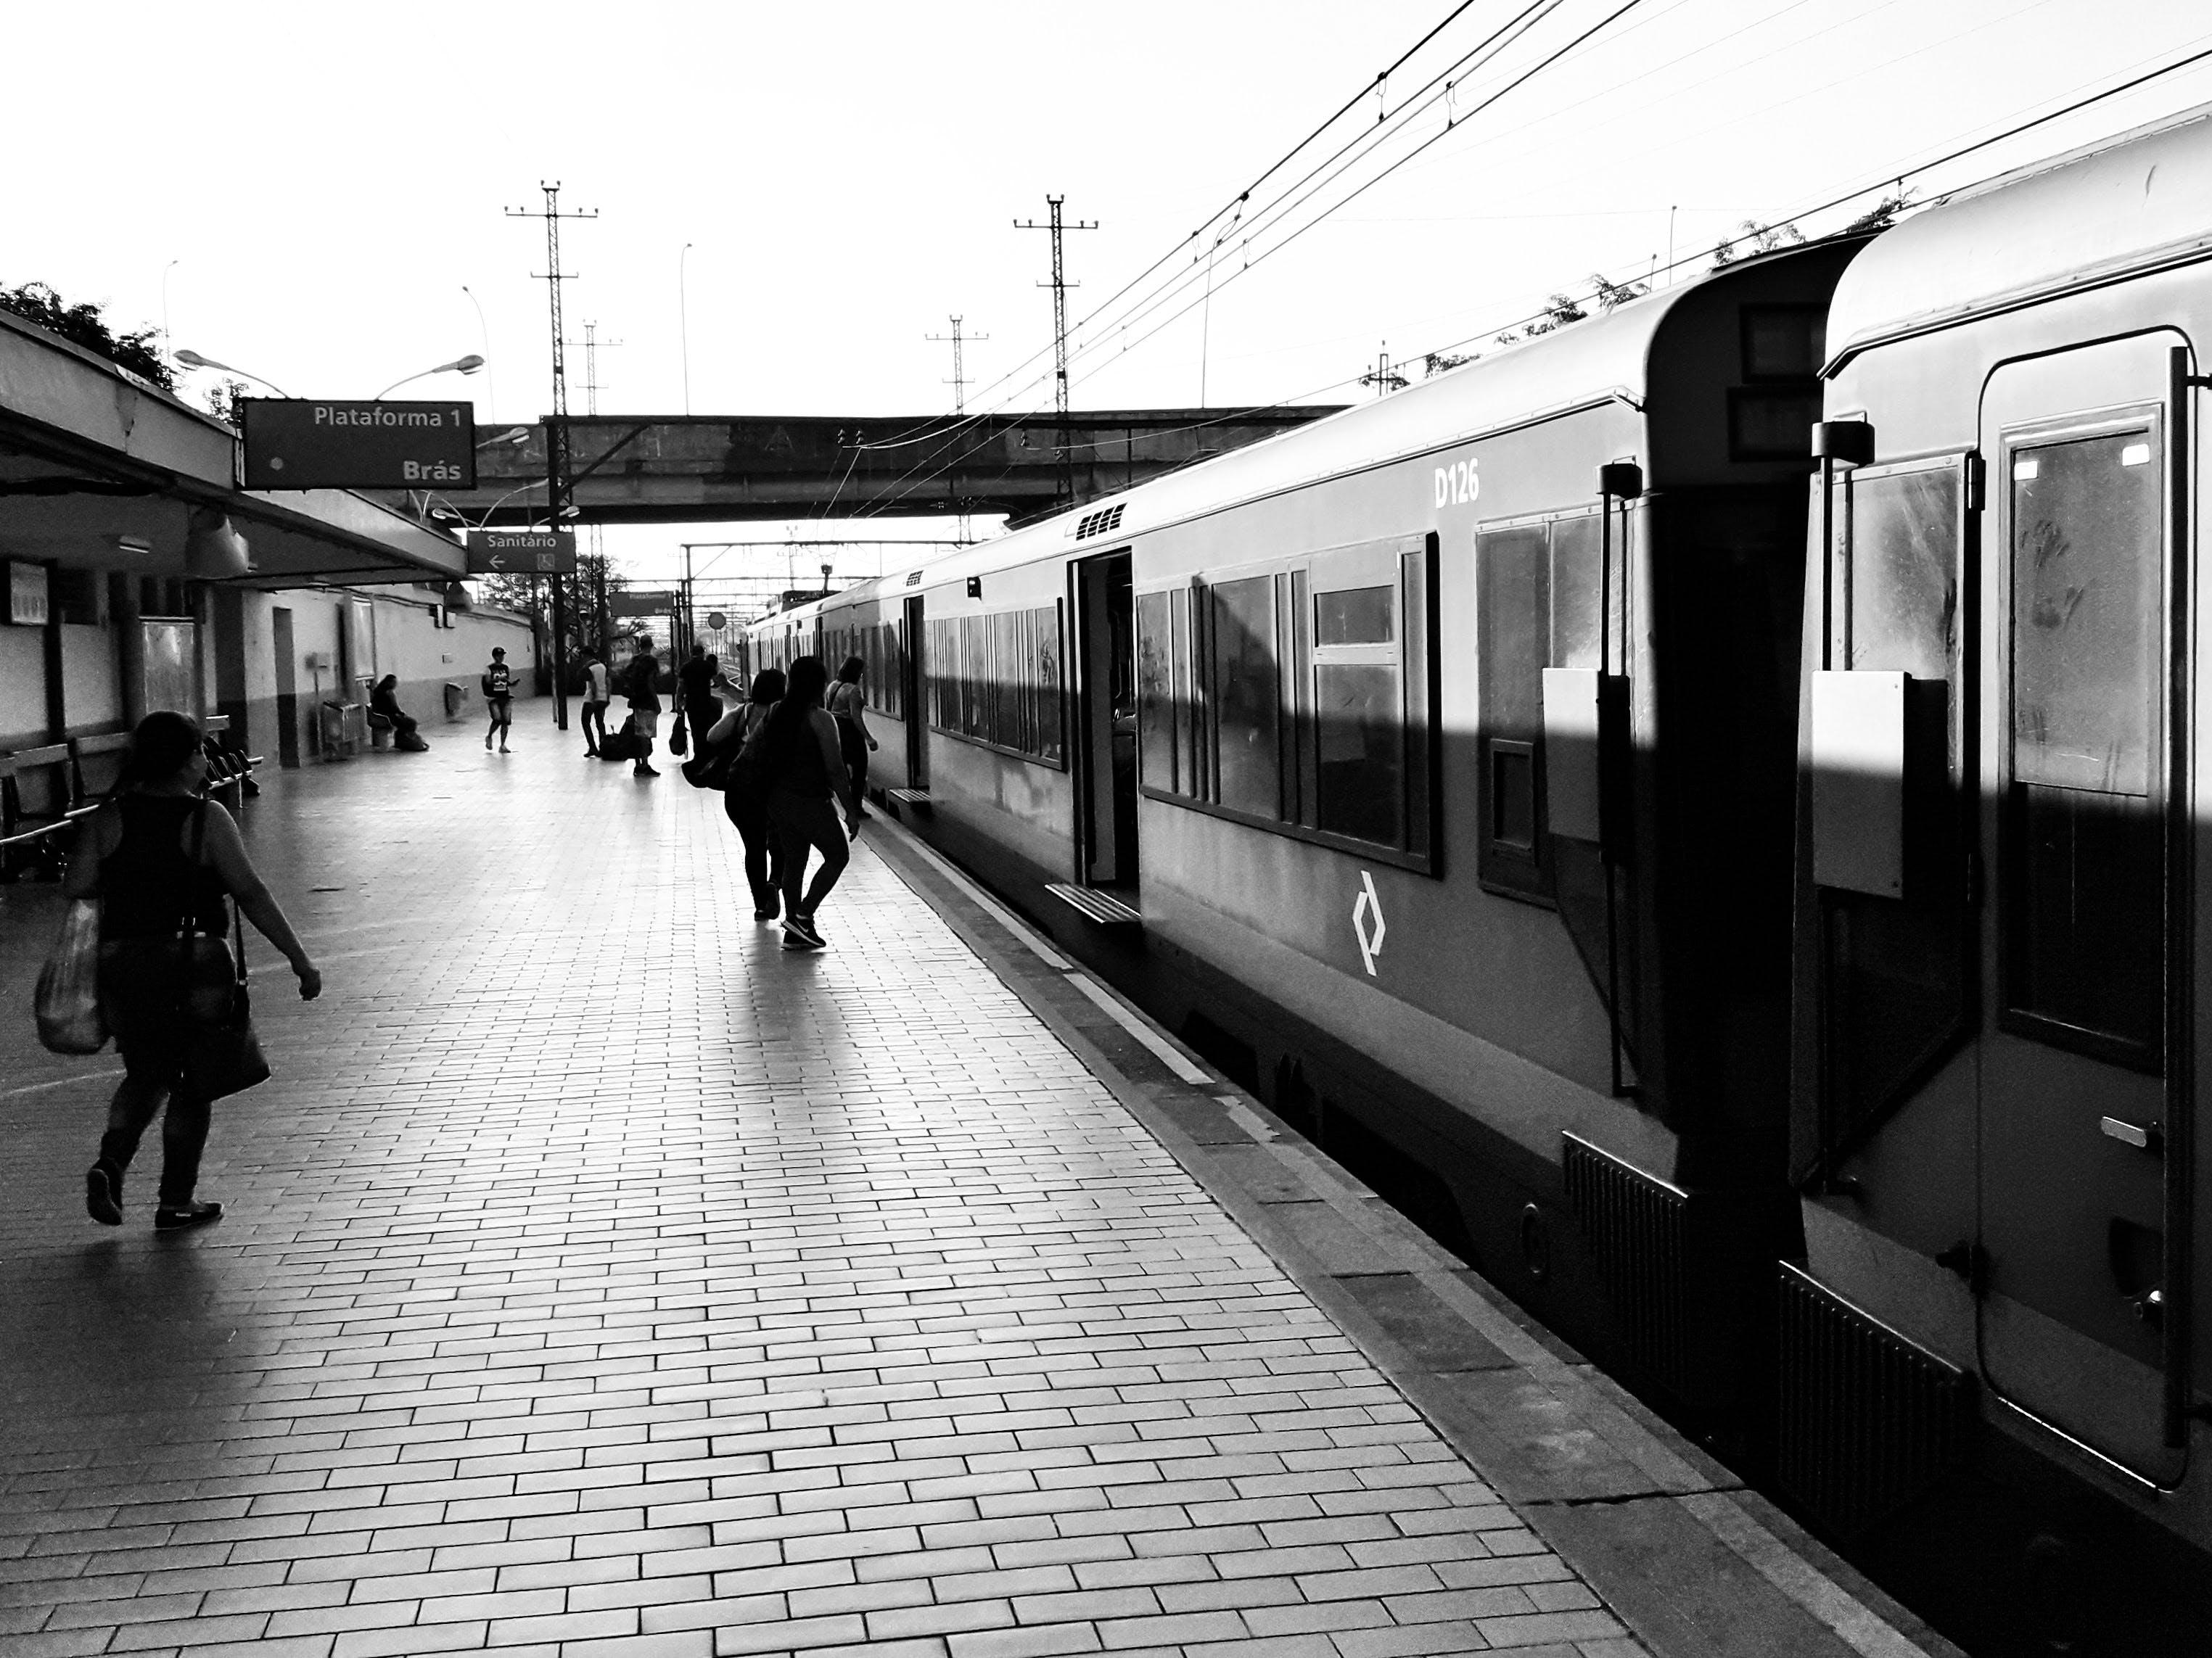 Free stock photo of mobilechallenge, train station